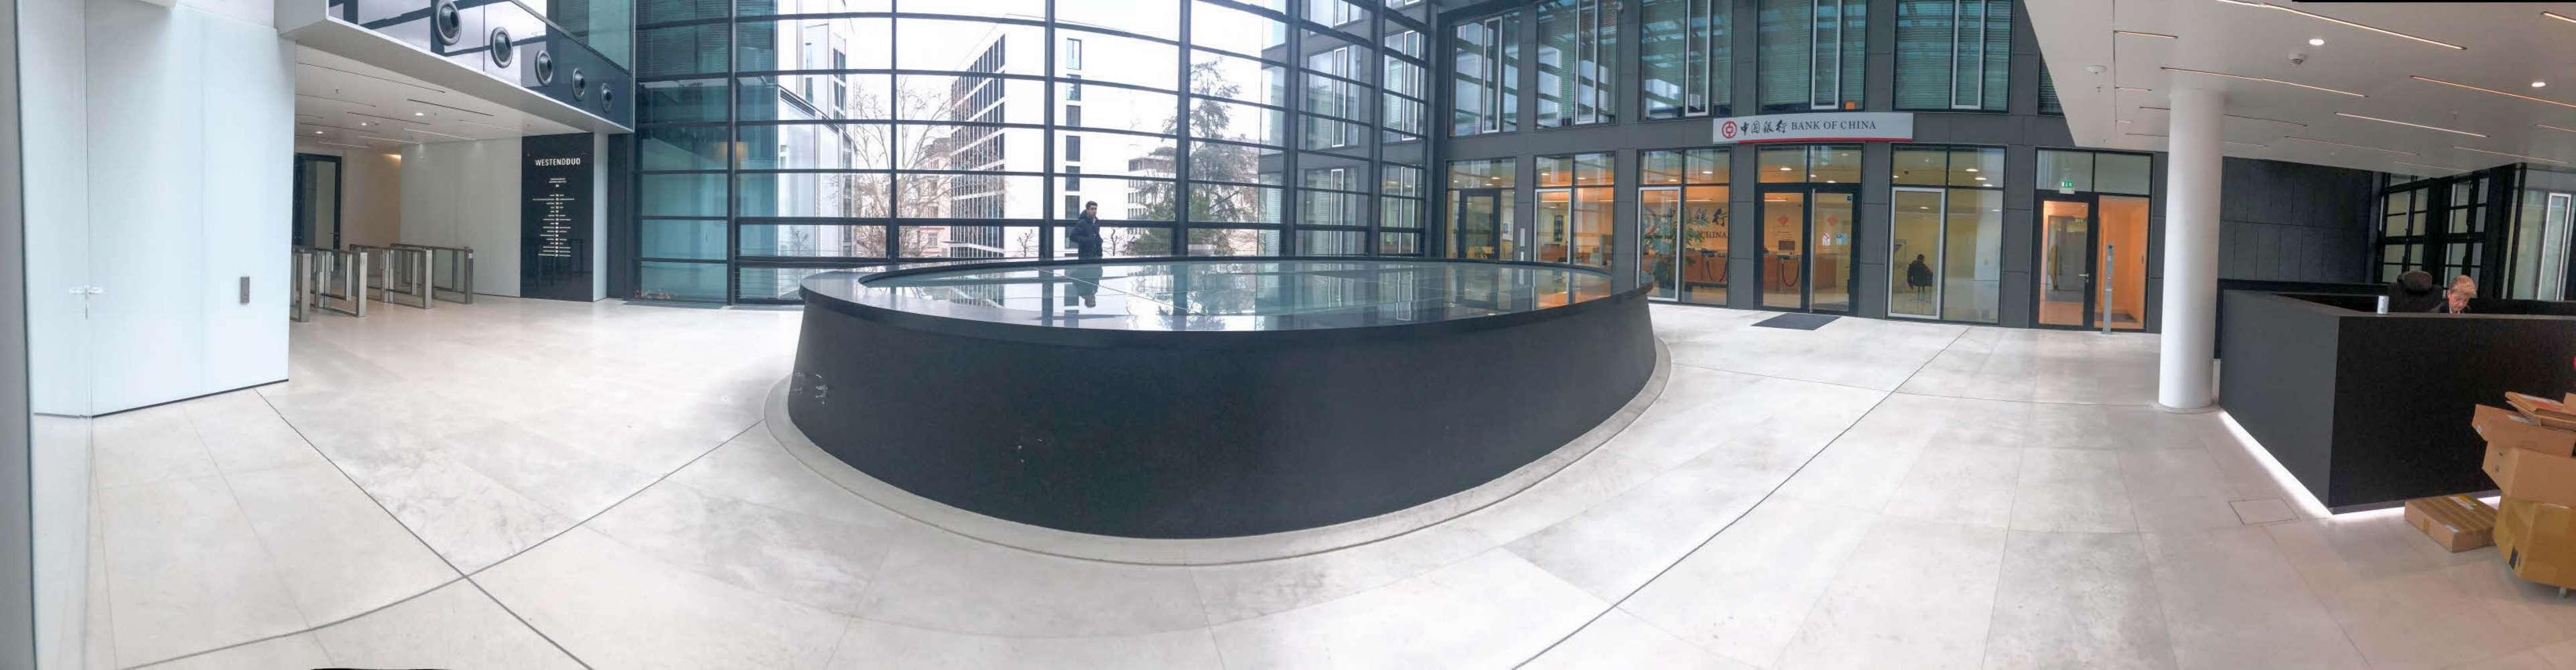 Büros Frankfurt am main, 60323 - Büro - Frankfurt am Main, Westend - F1042 - 10599878